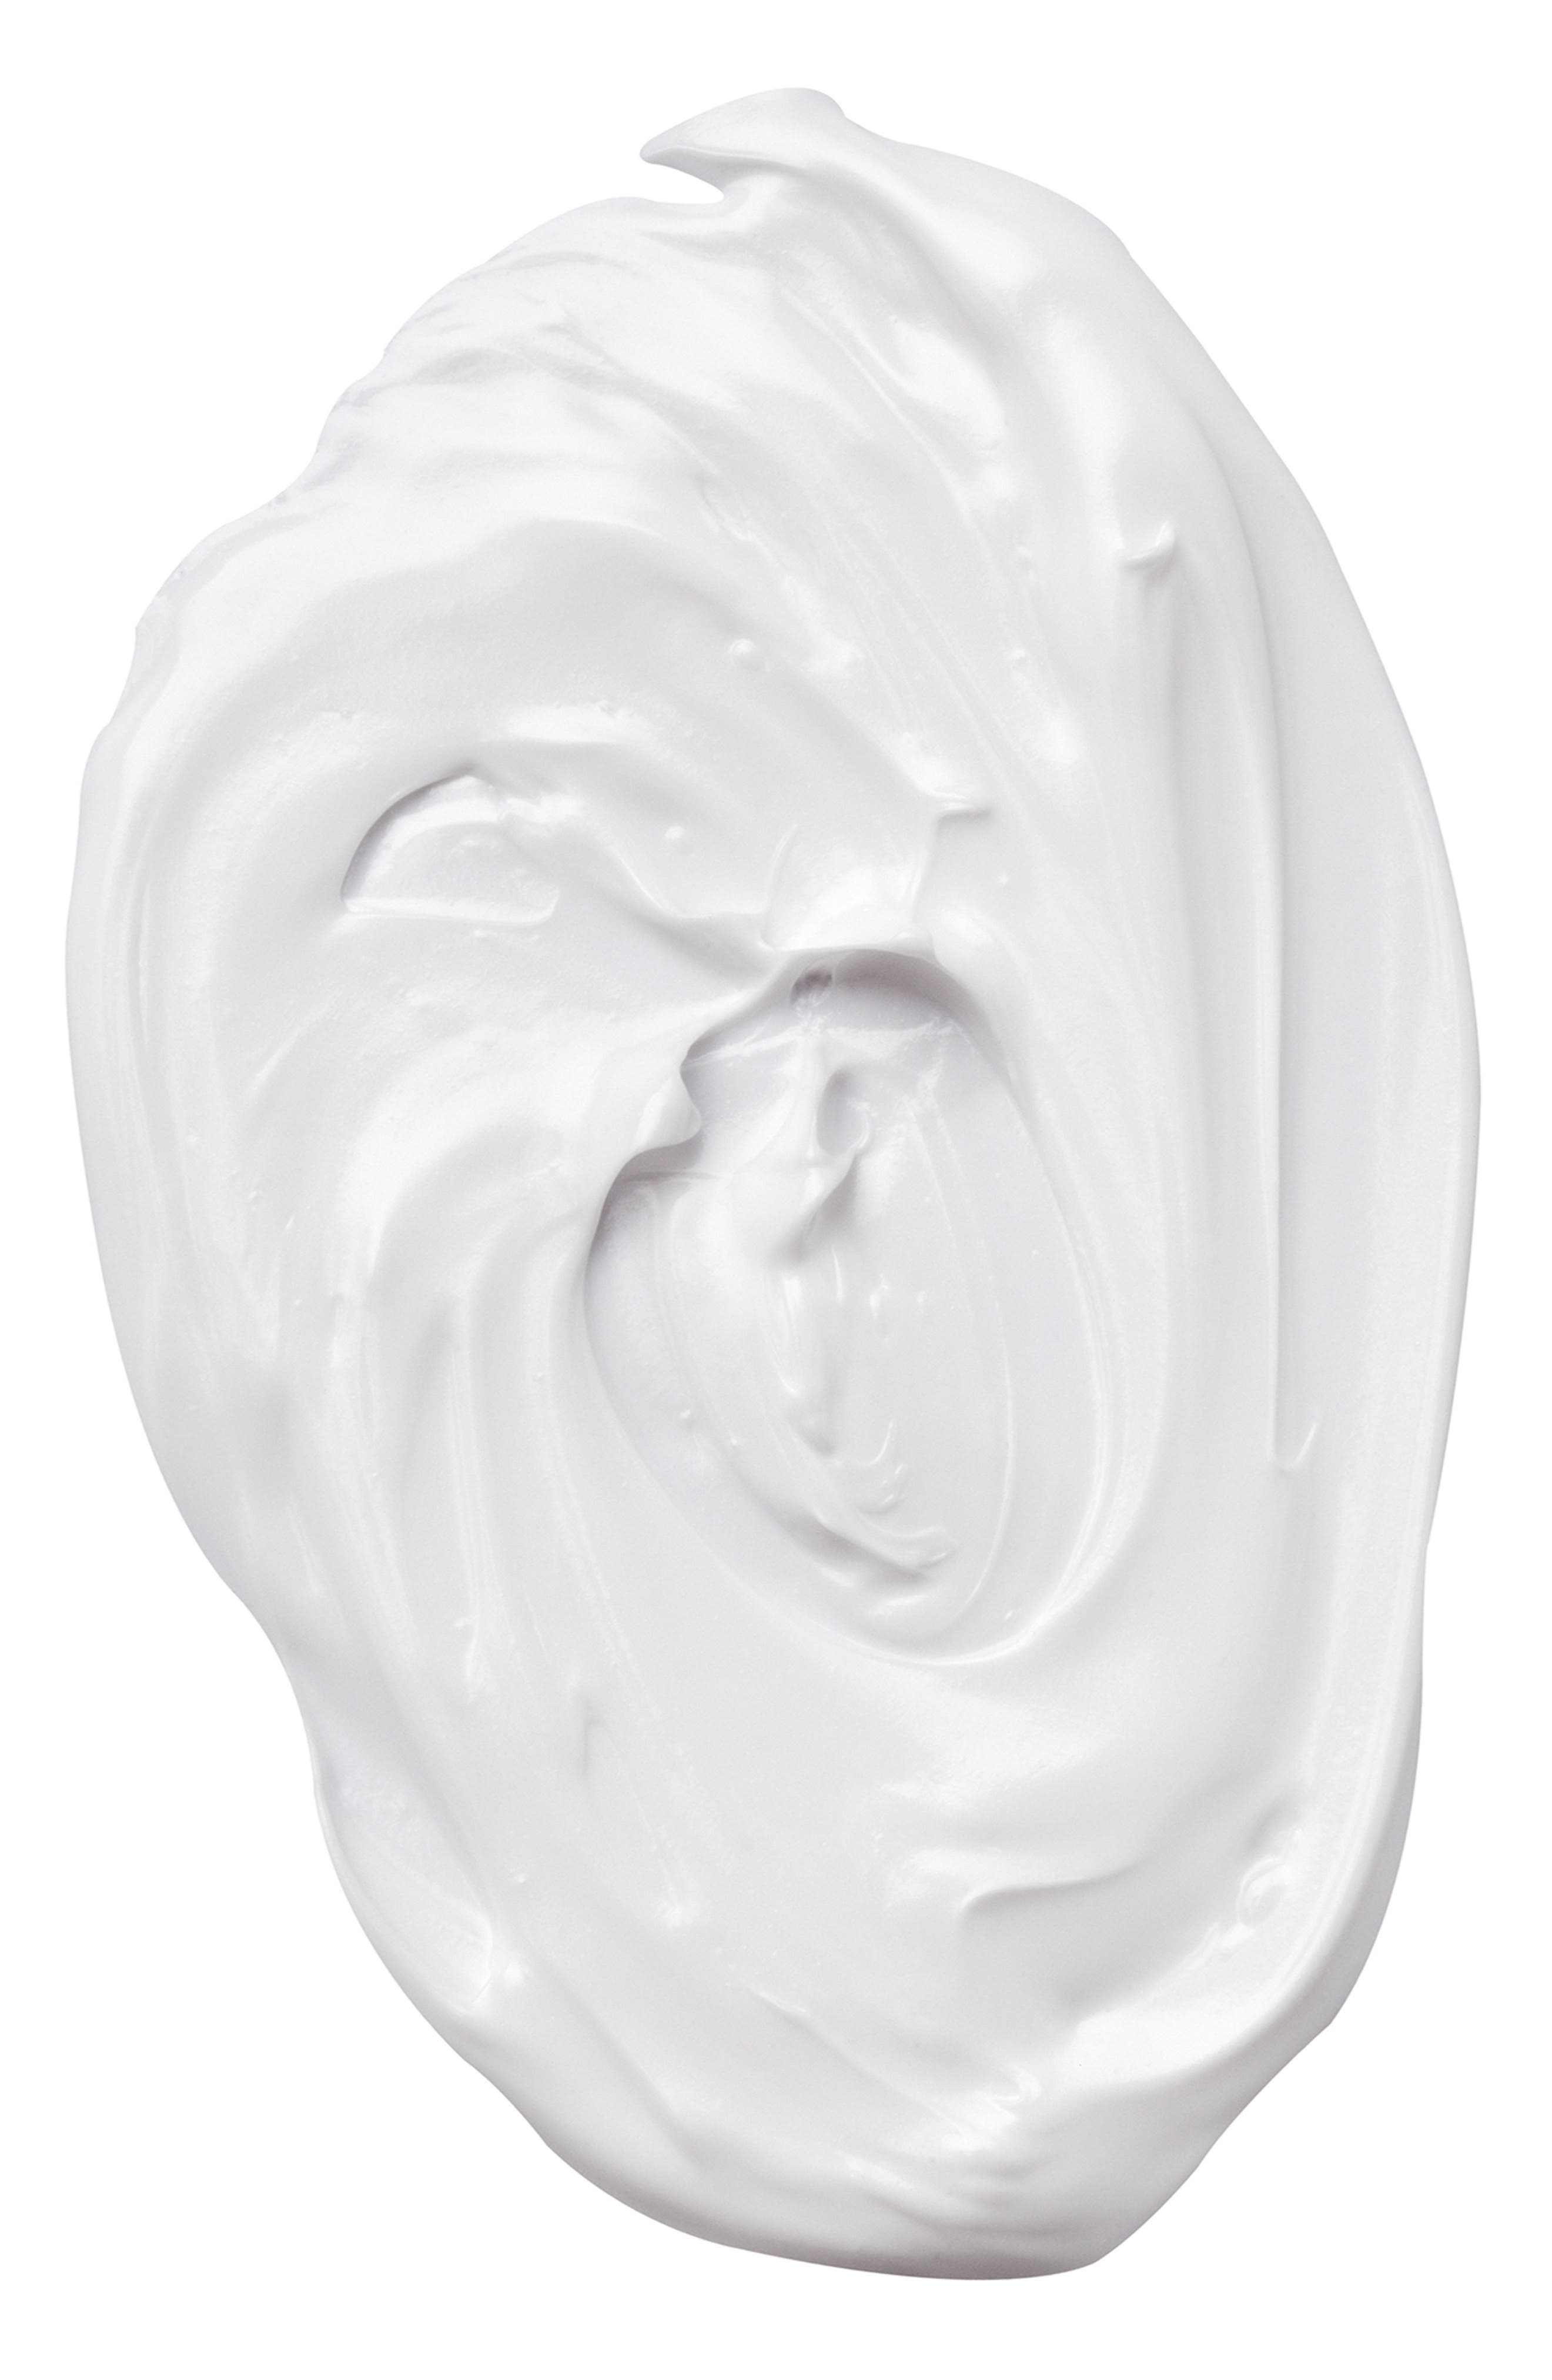 Double Rose Rejuvenating Face Cream,                             Alternate thumbnail 2, color,                             NONE